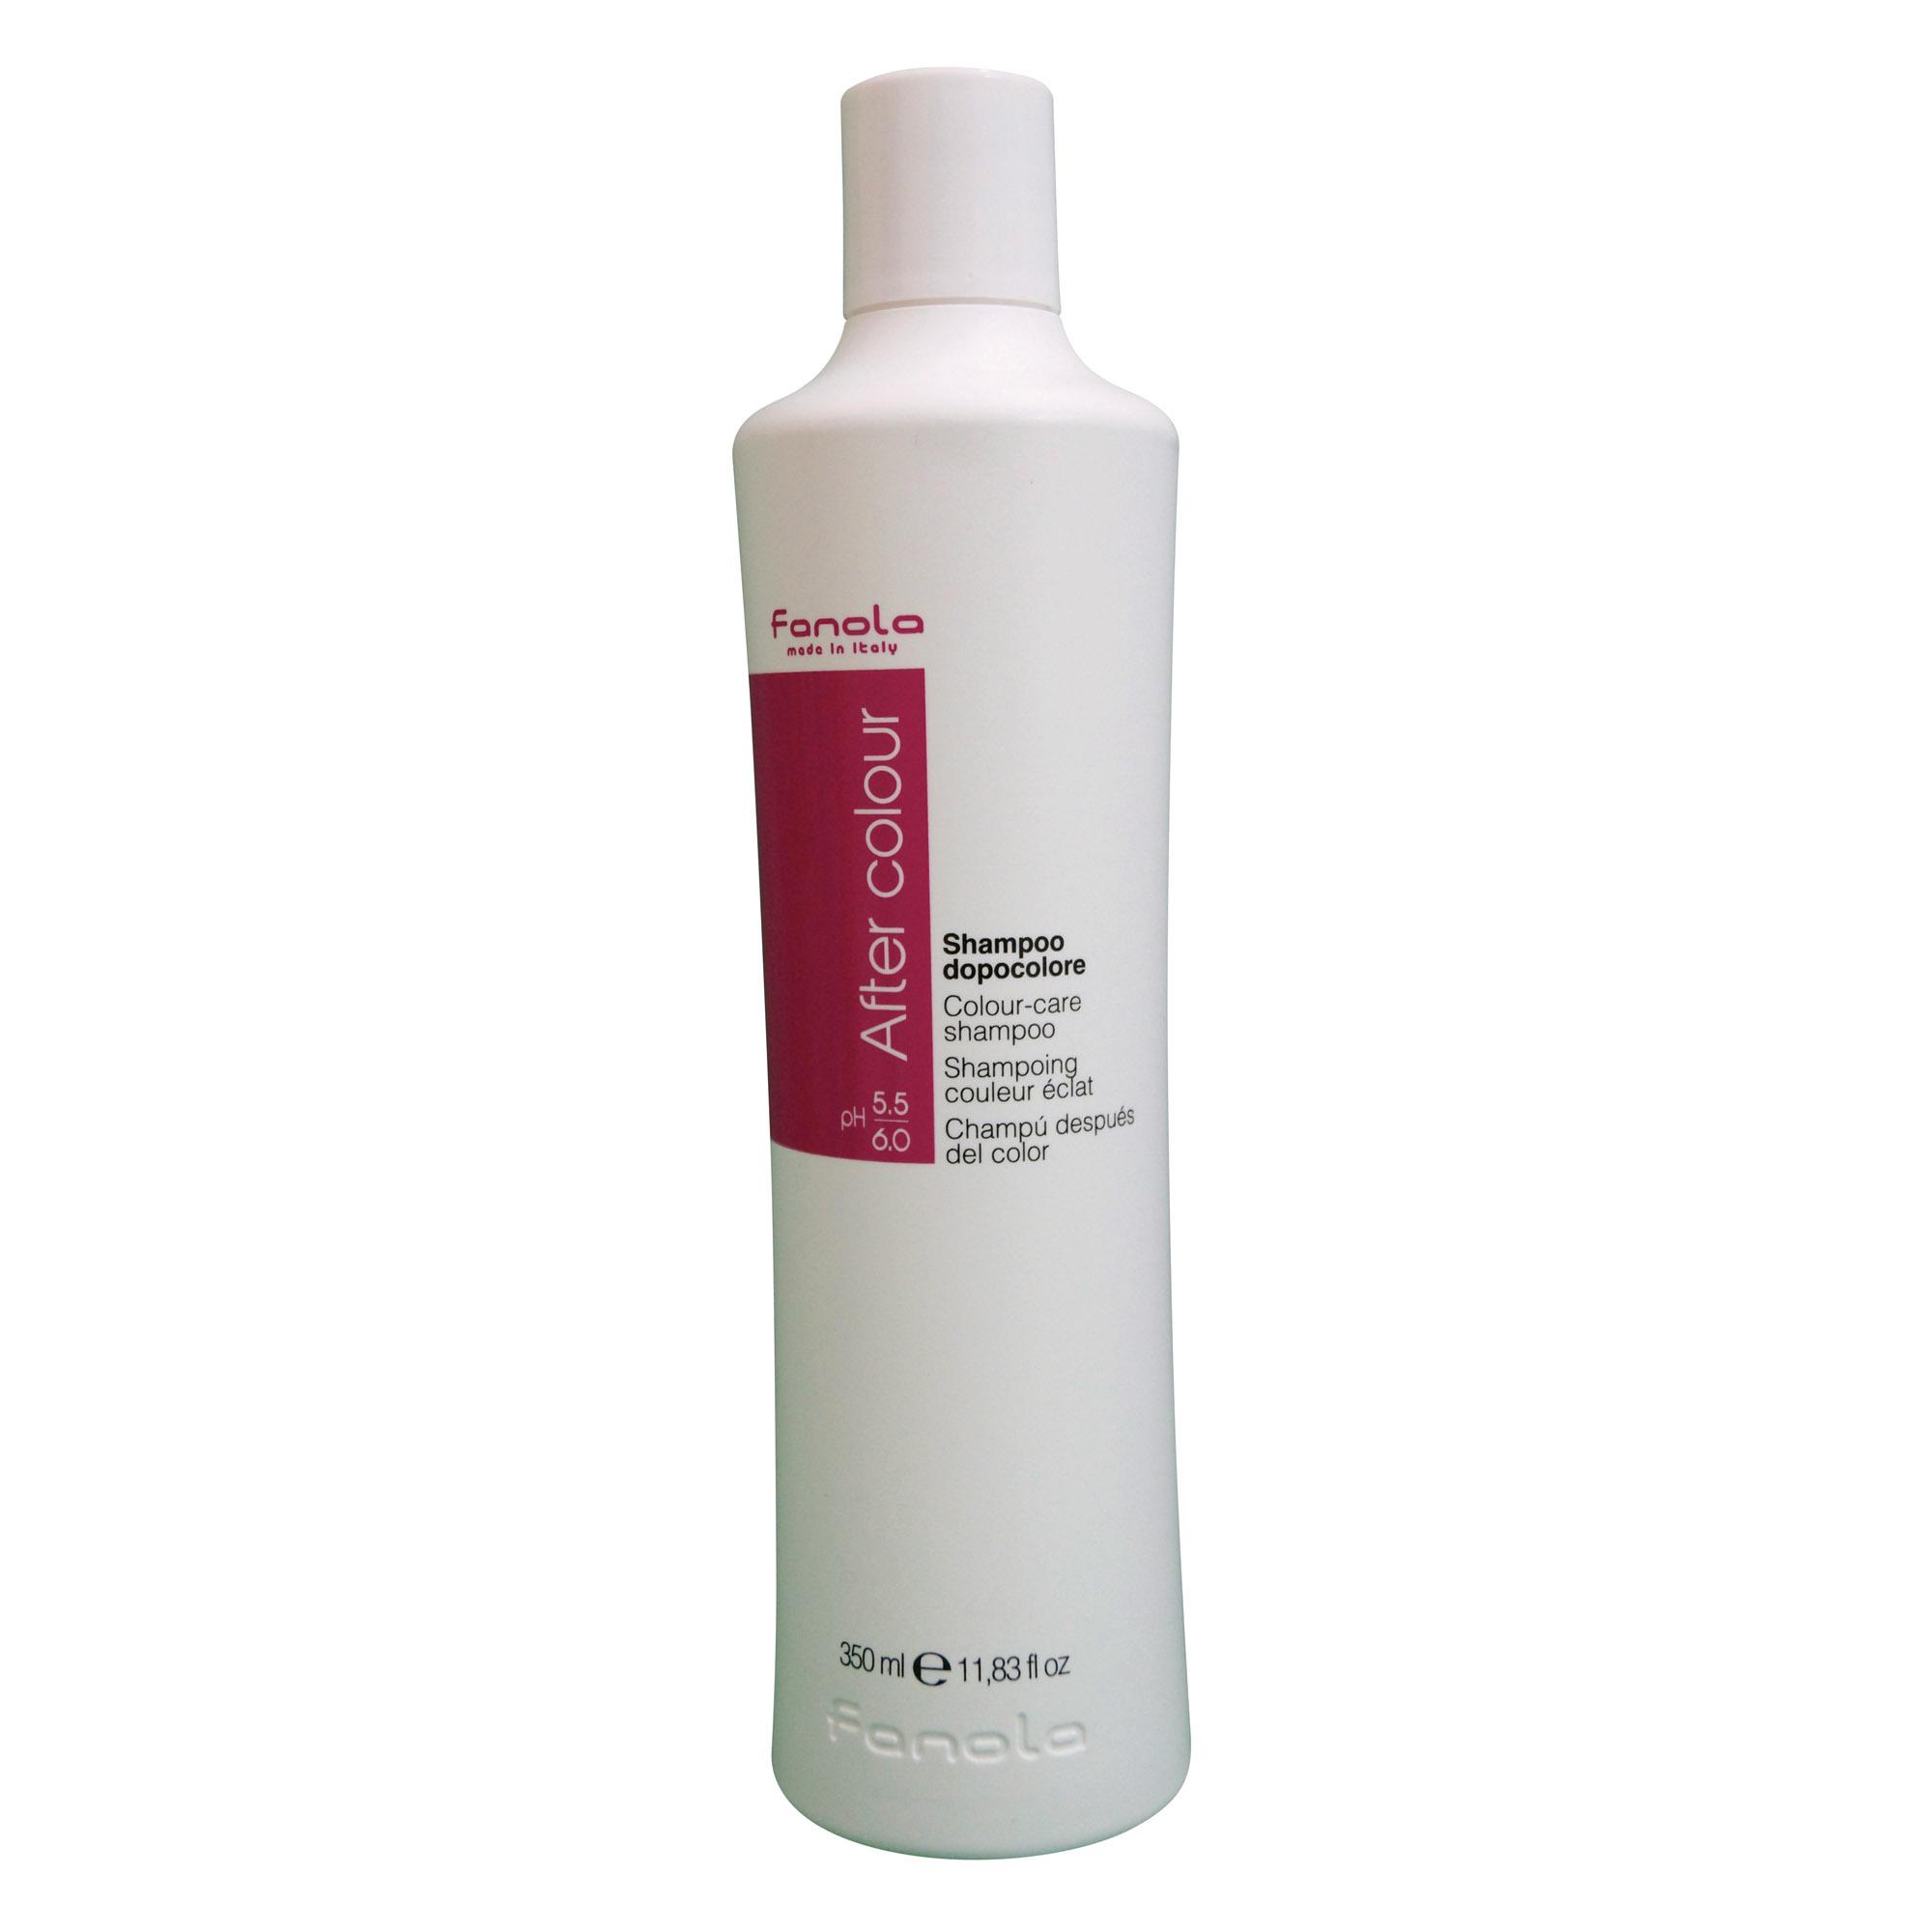 Fanola After Color Shampoo 11.38 OZ - image 1 of 1